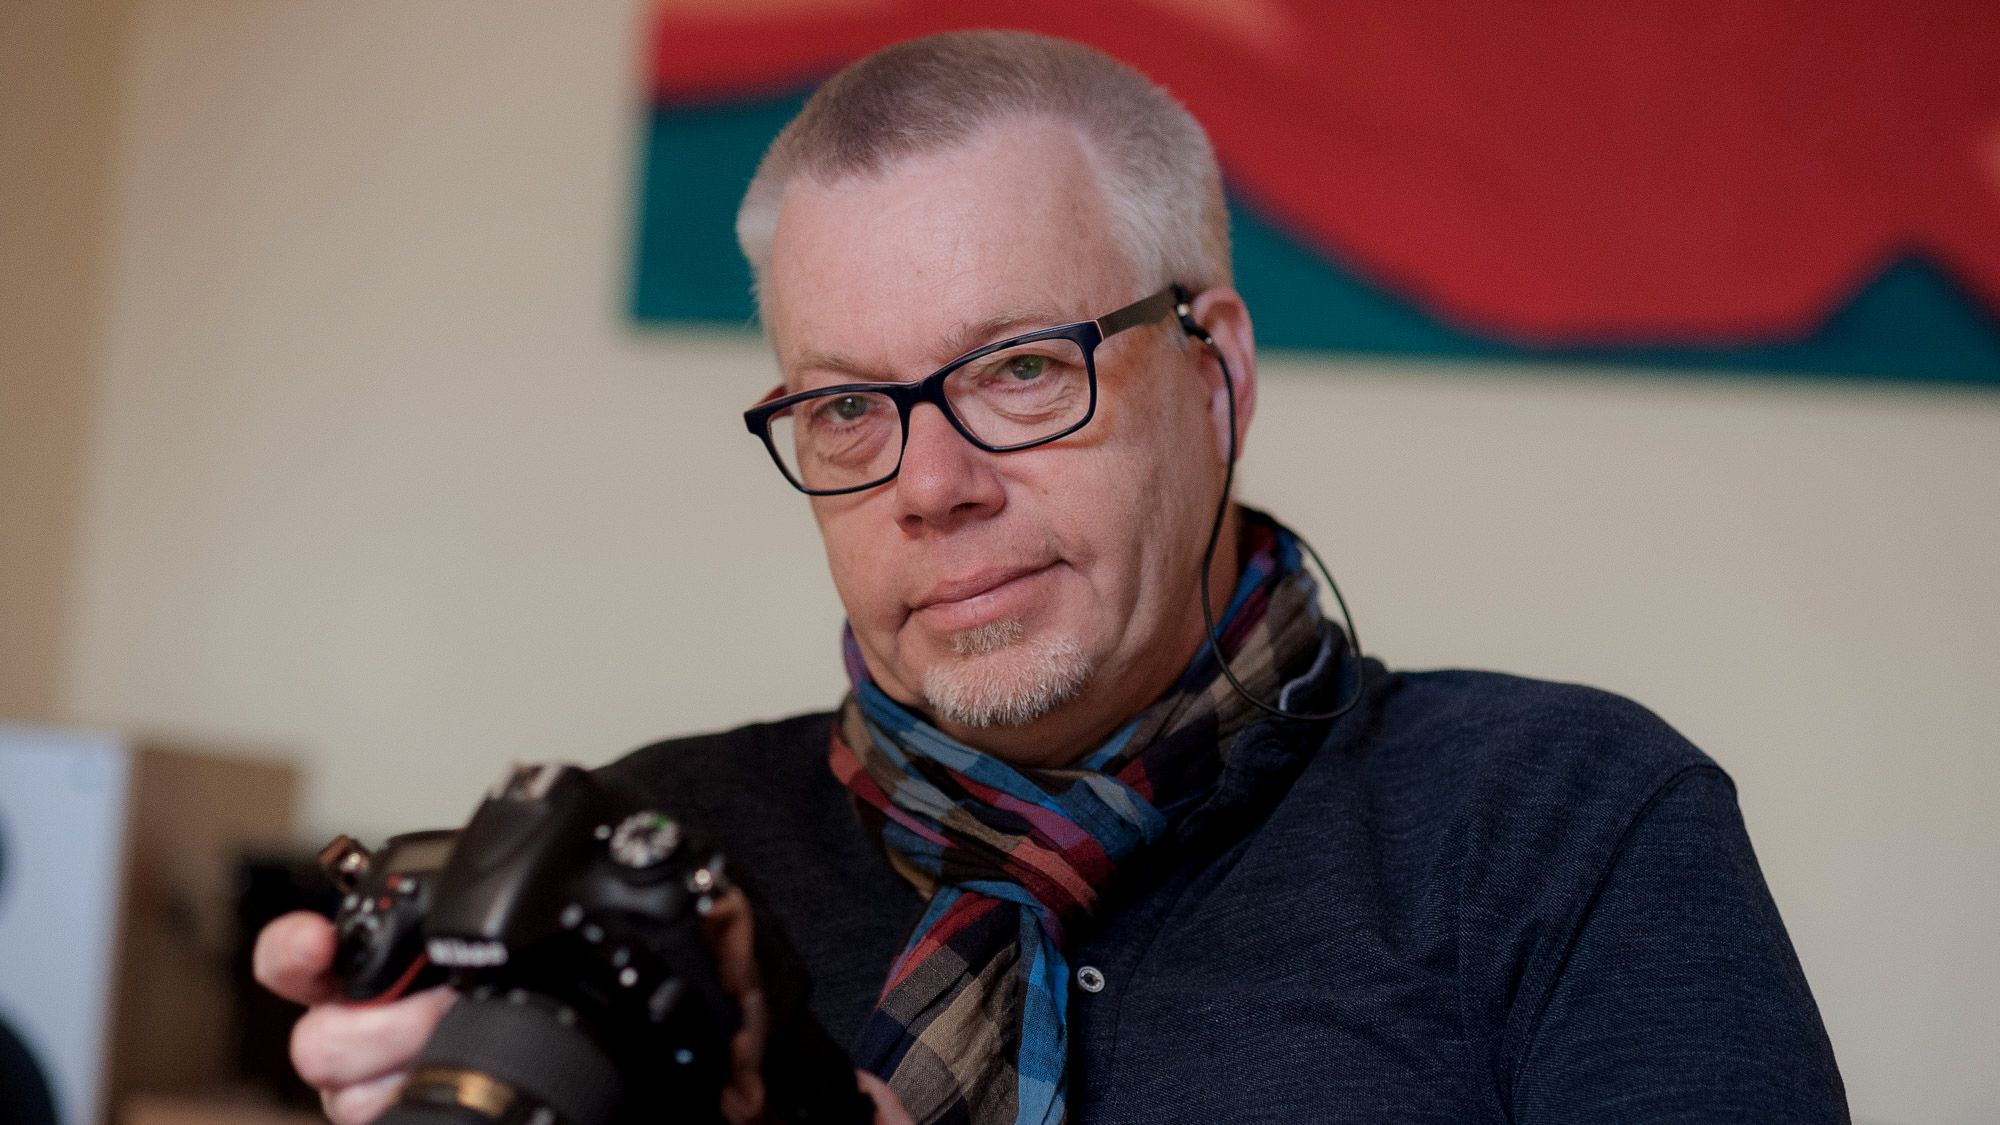 MedienFlotte Joachim Albrecht